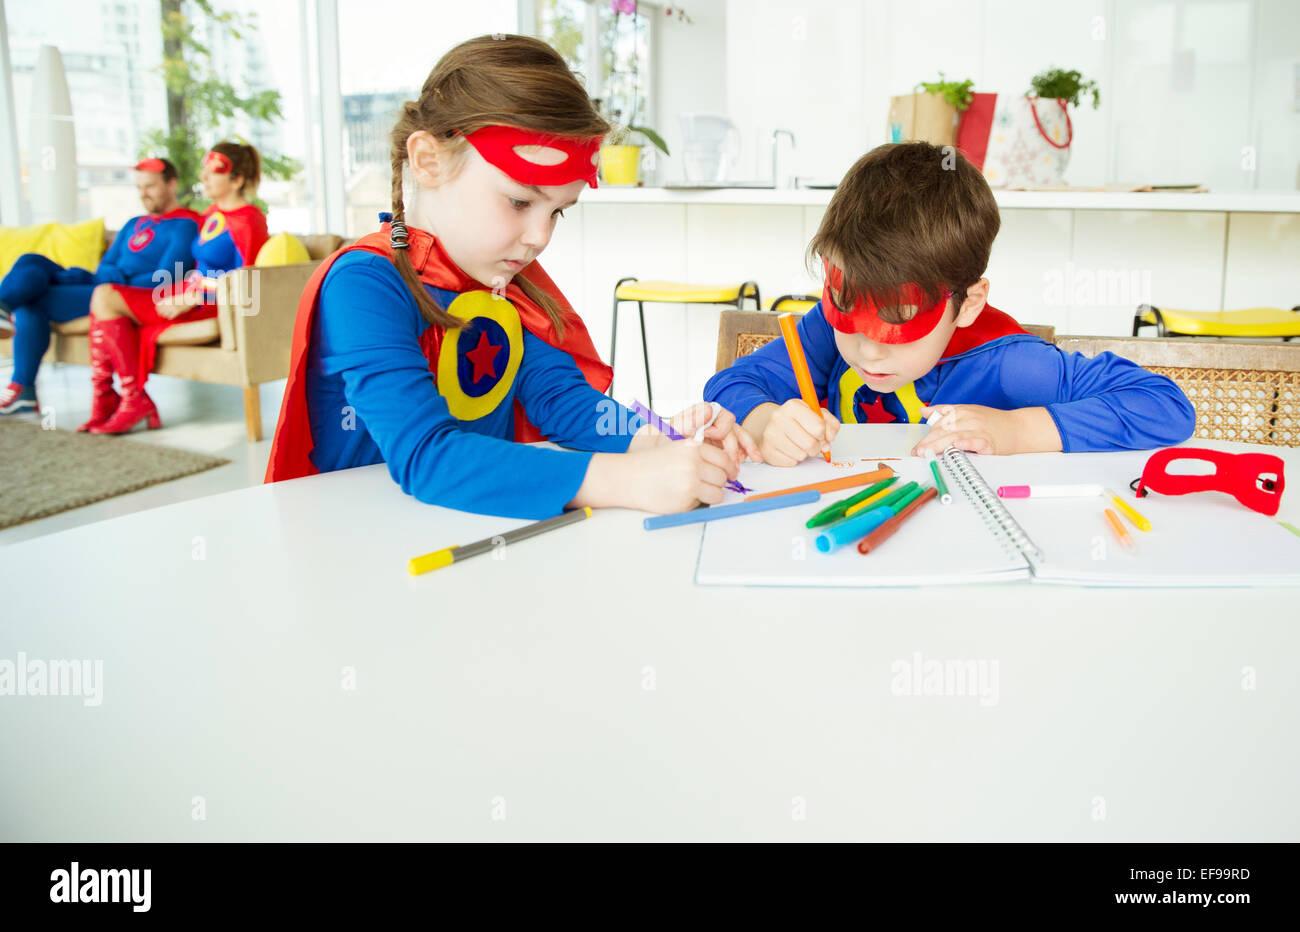 superhero cape art stockfotos superhero cape art bilder alamy. Black Bedroom Furniture Sets. Home Design Ideas